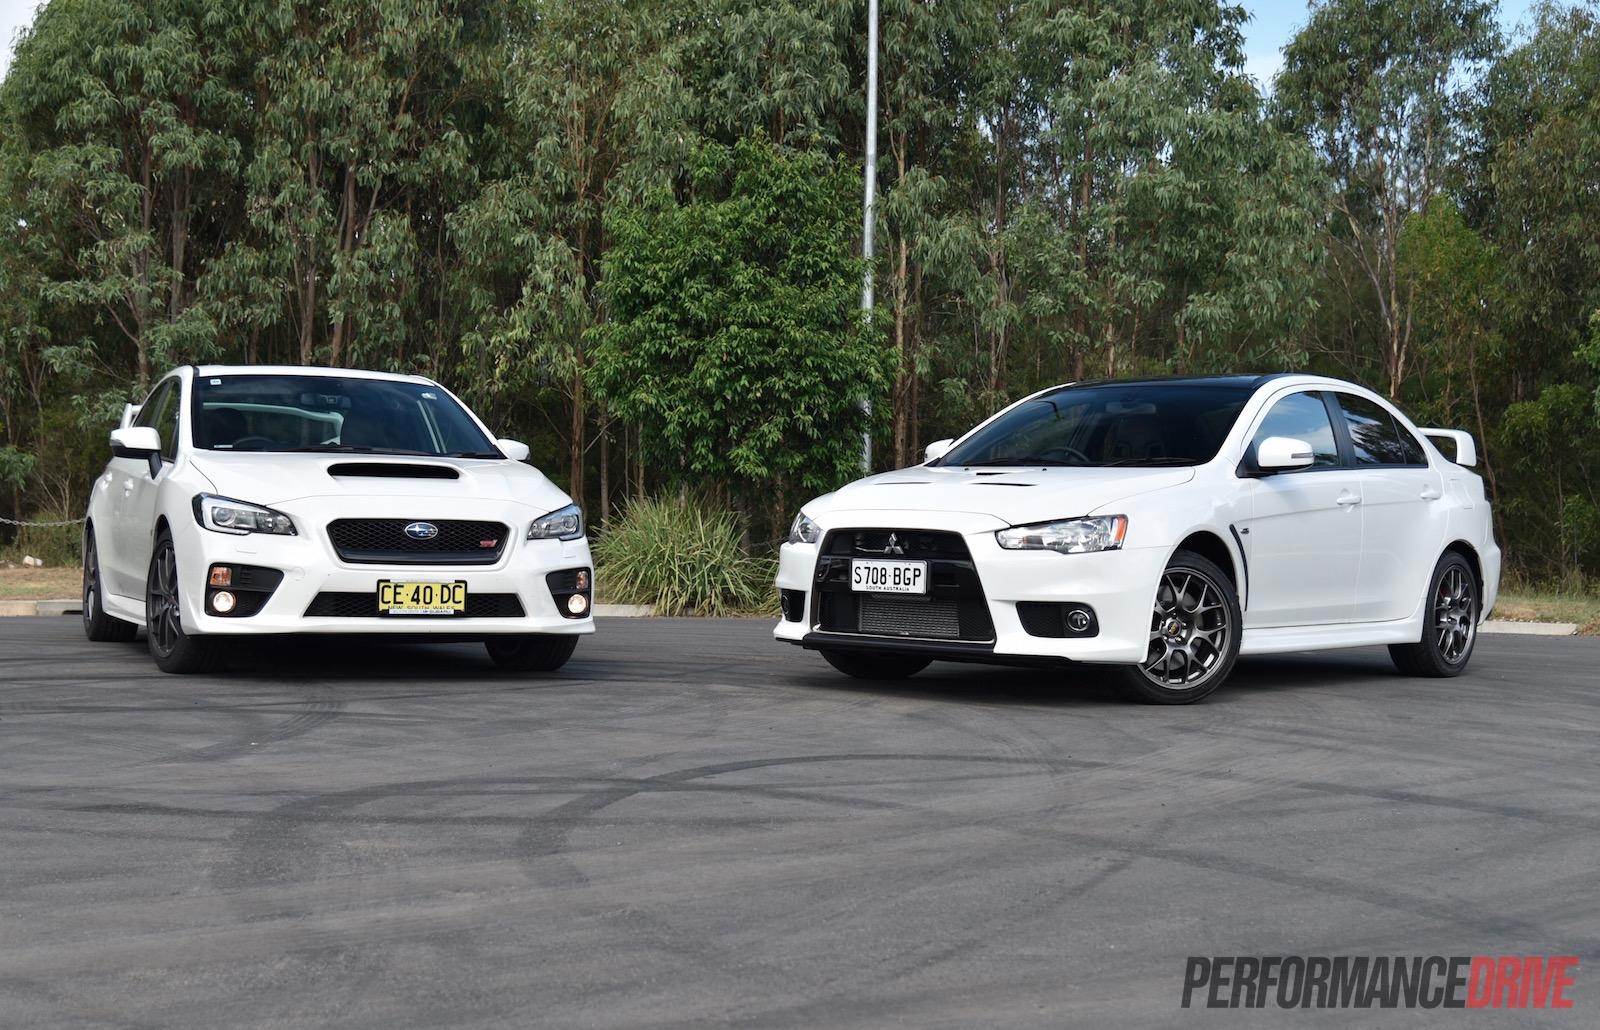 2018 Wrx 0 To 60 >> 2016 Mitsubishi Lancer Evolution vs Subaru WRX STI: comparison (video) | PerformanceDrive